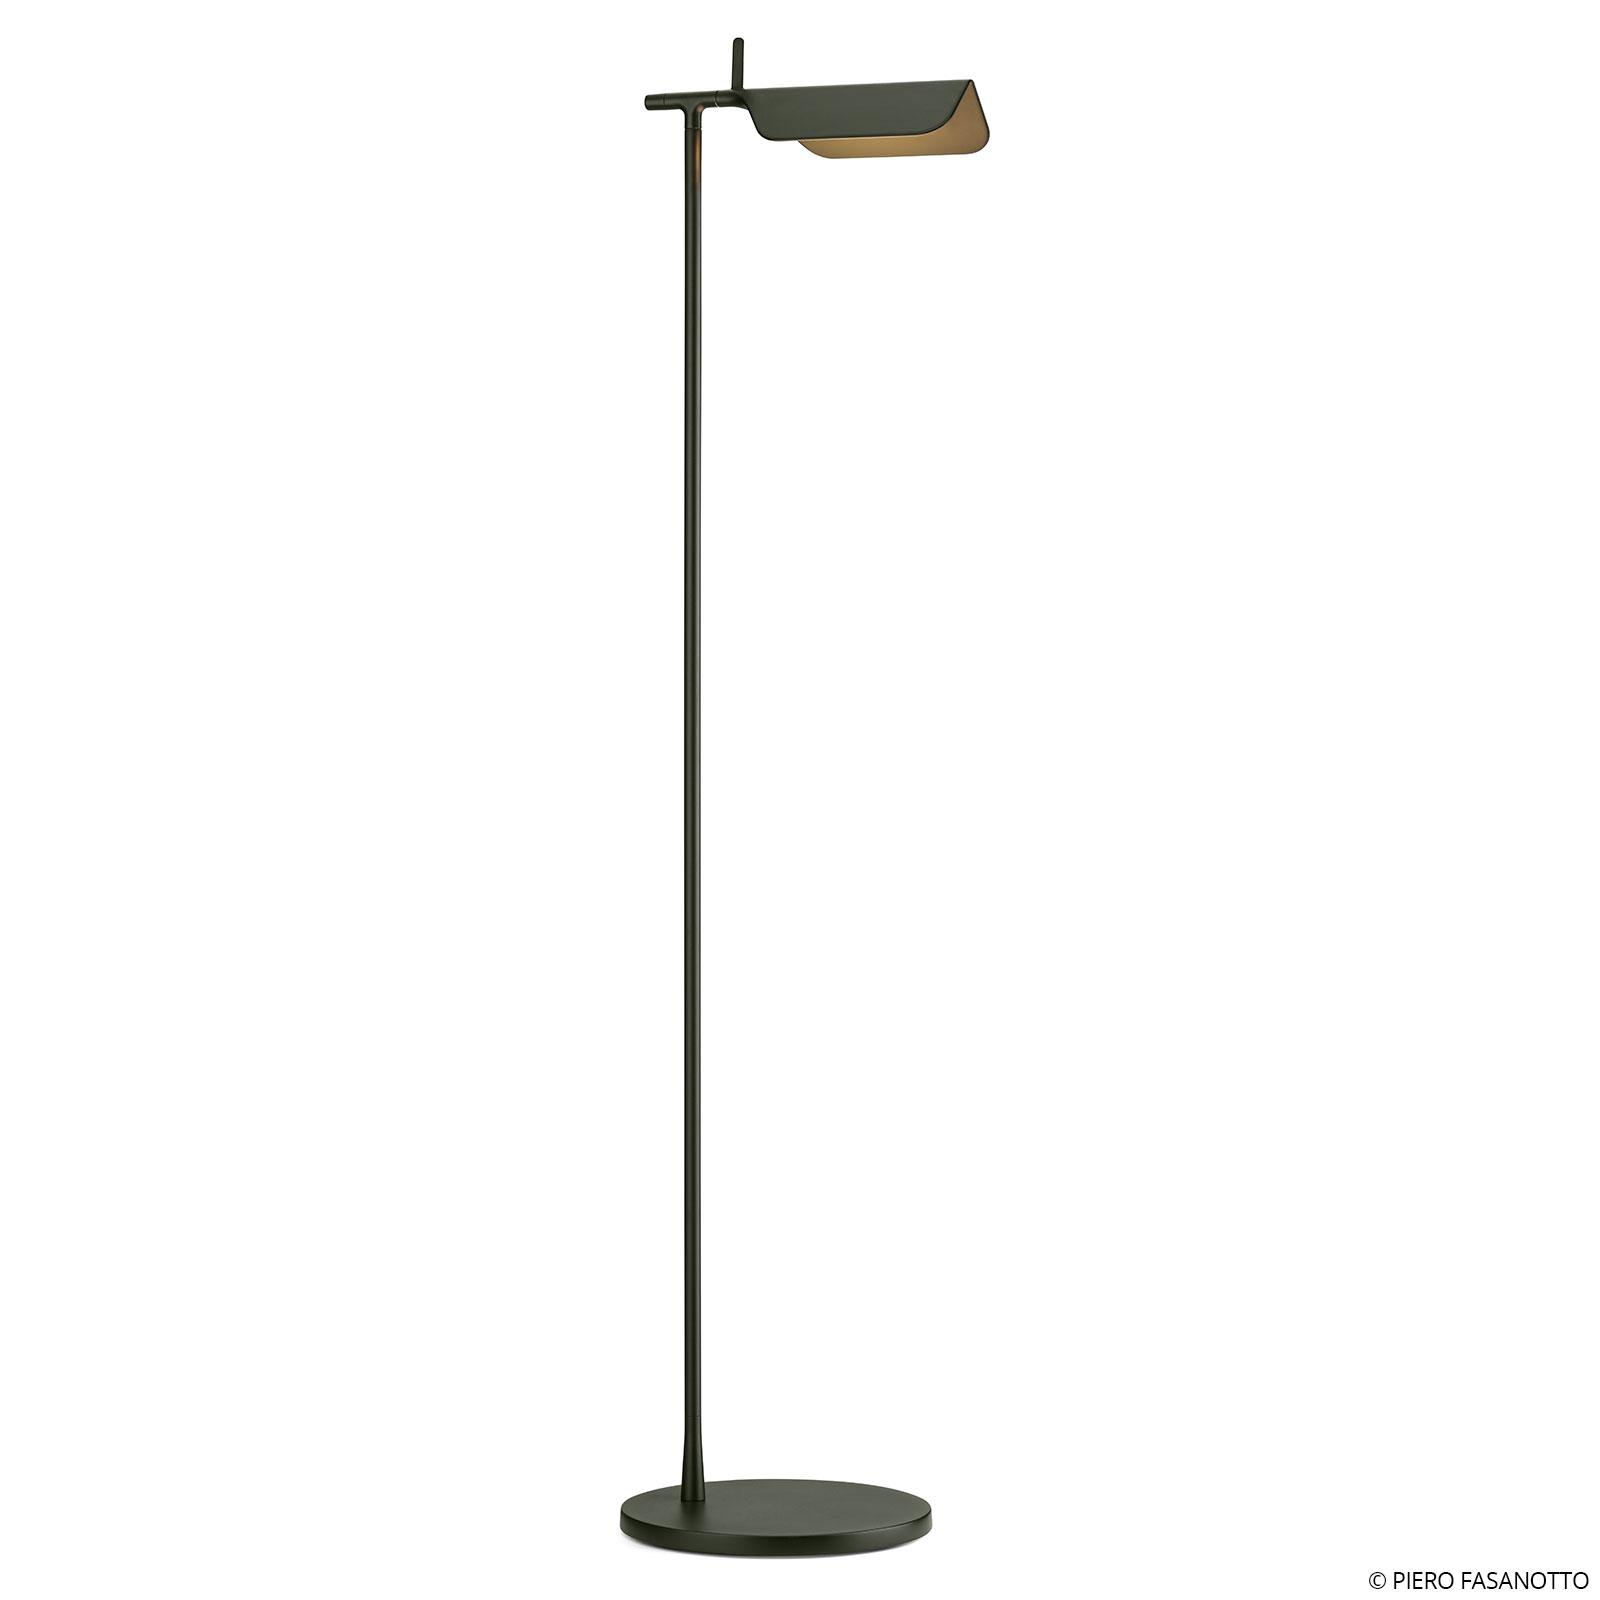 FLOS Tab F LED-Stehleuchte, dunkelgrün matt